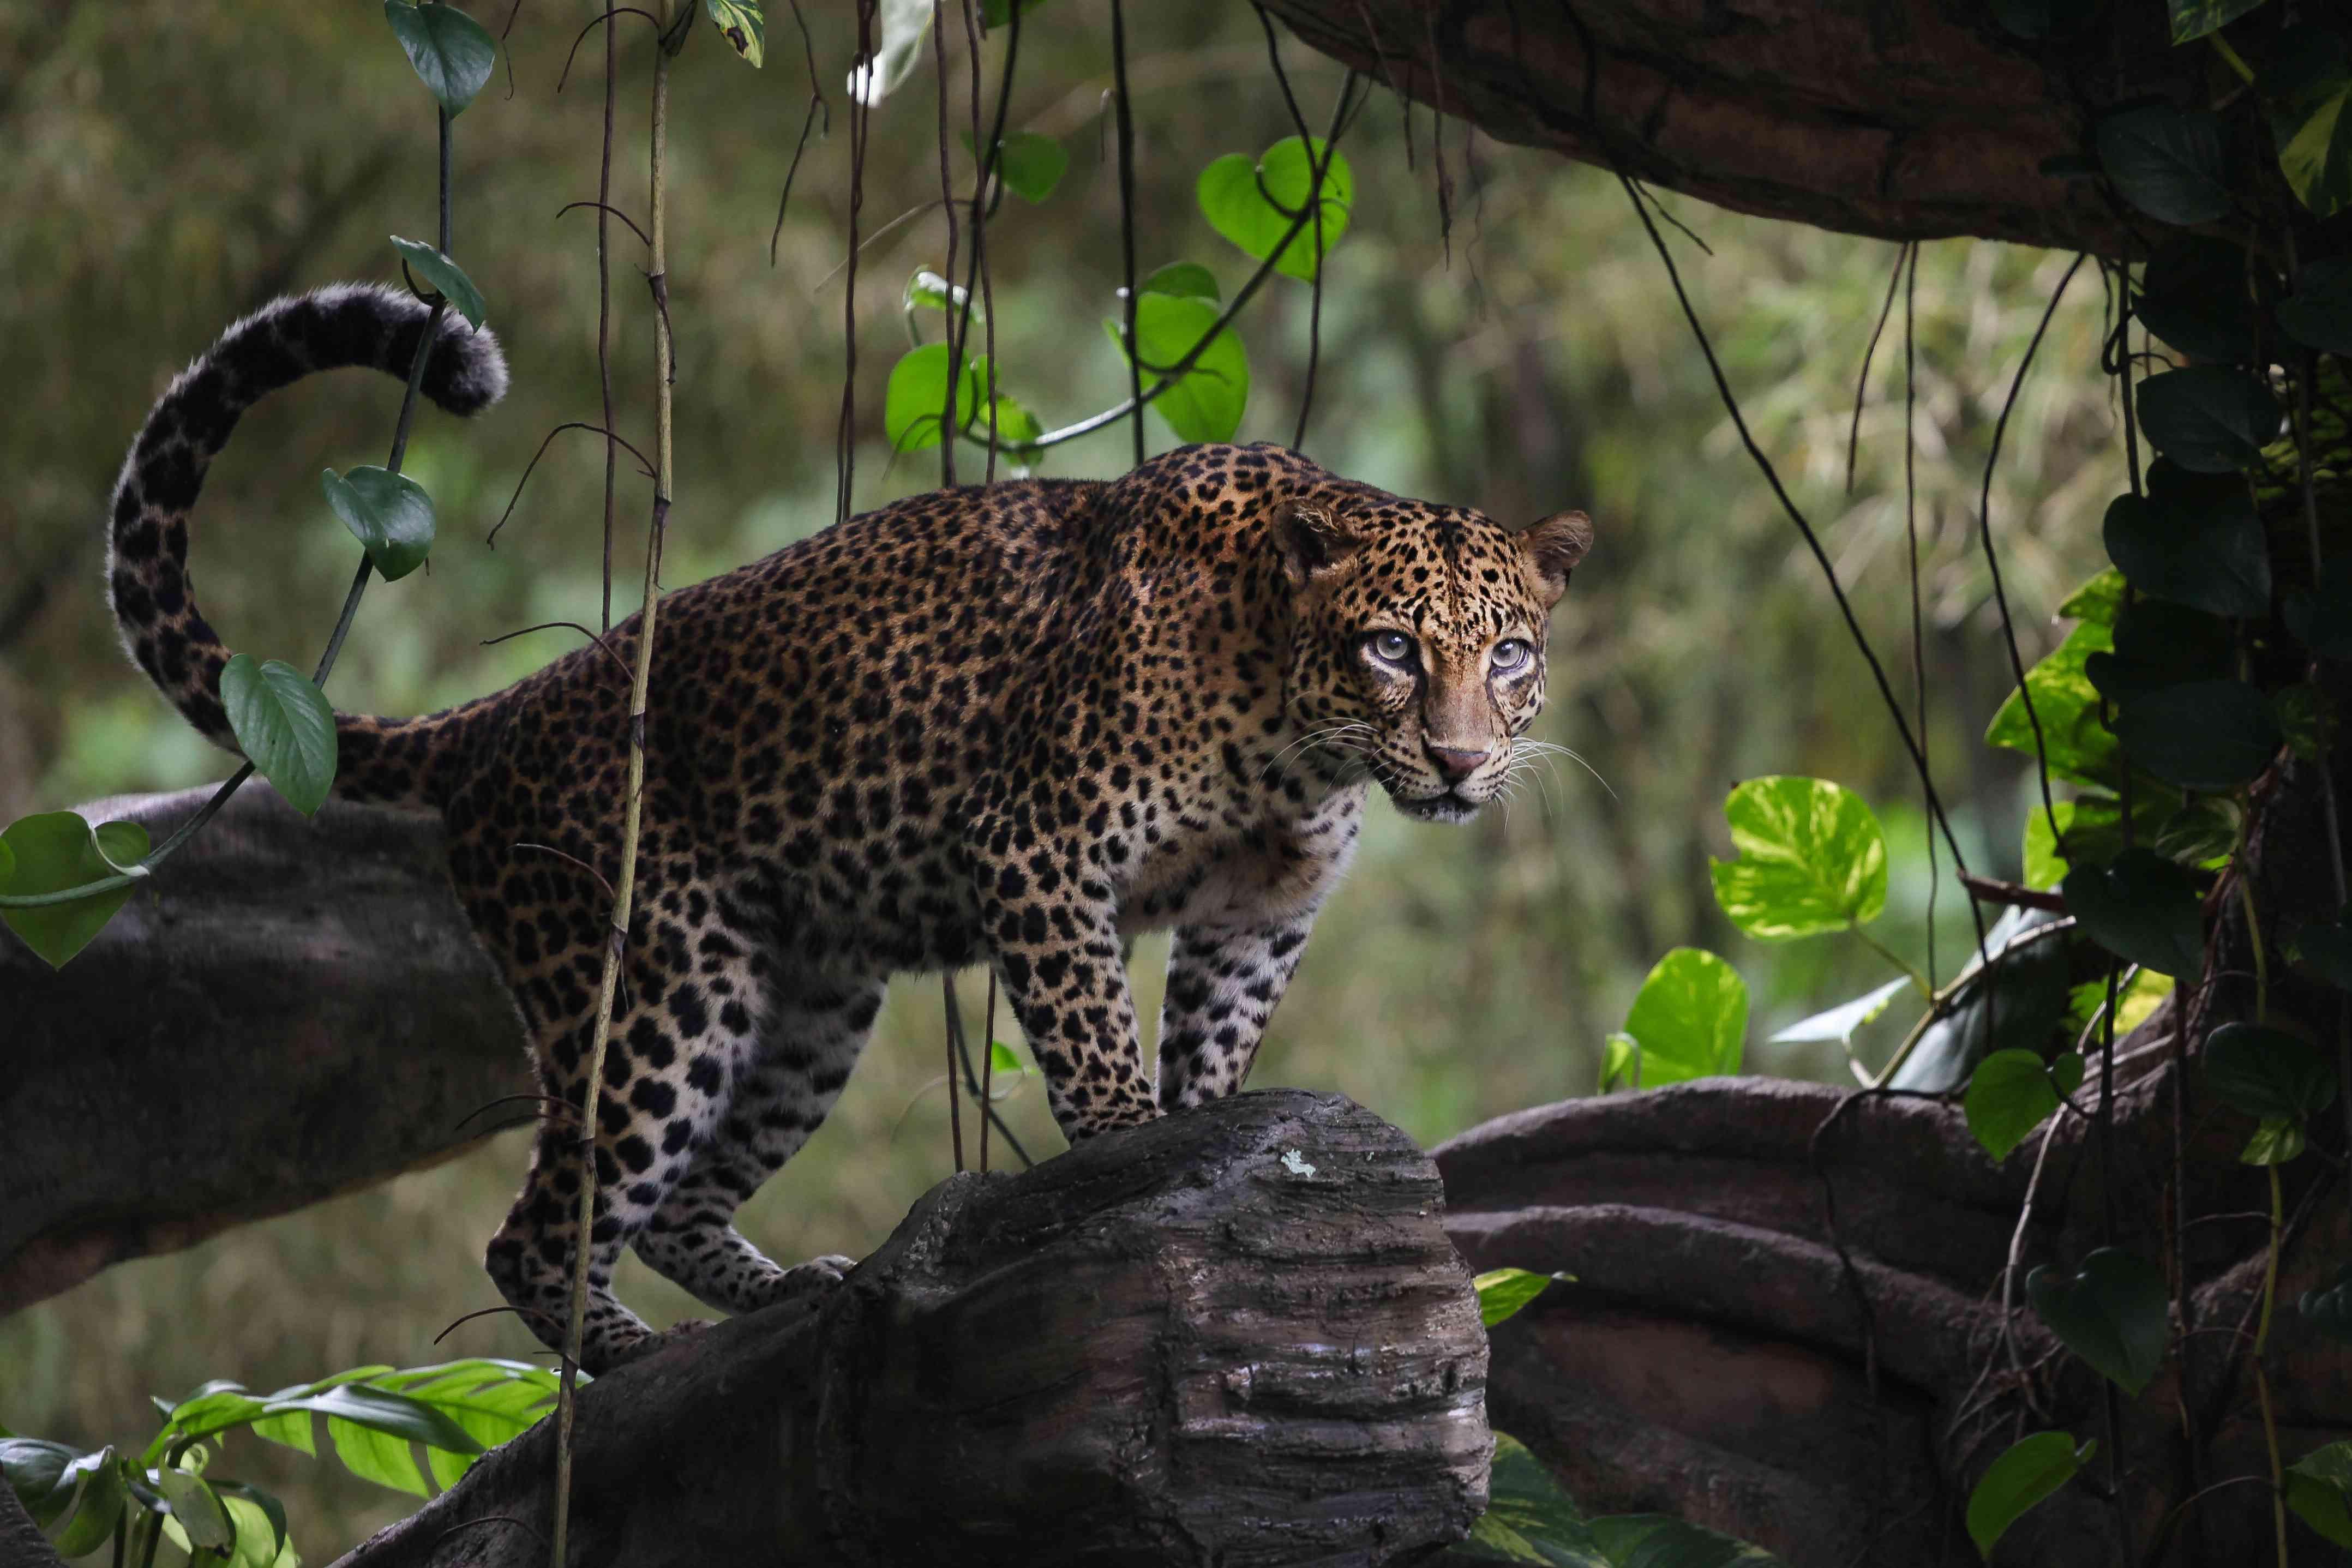 A leopard in a tree in Indonesia